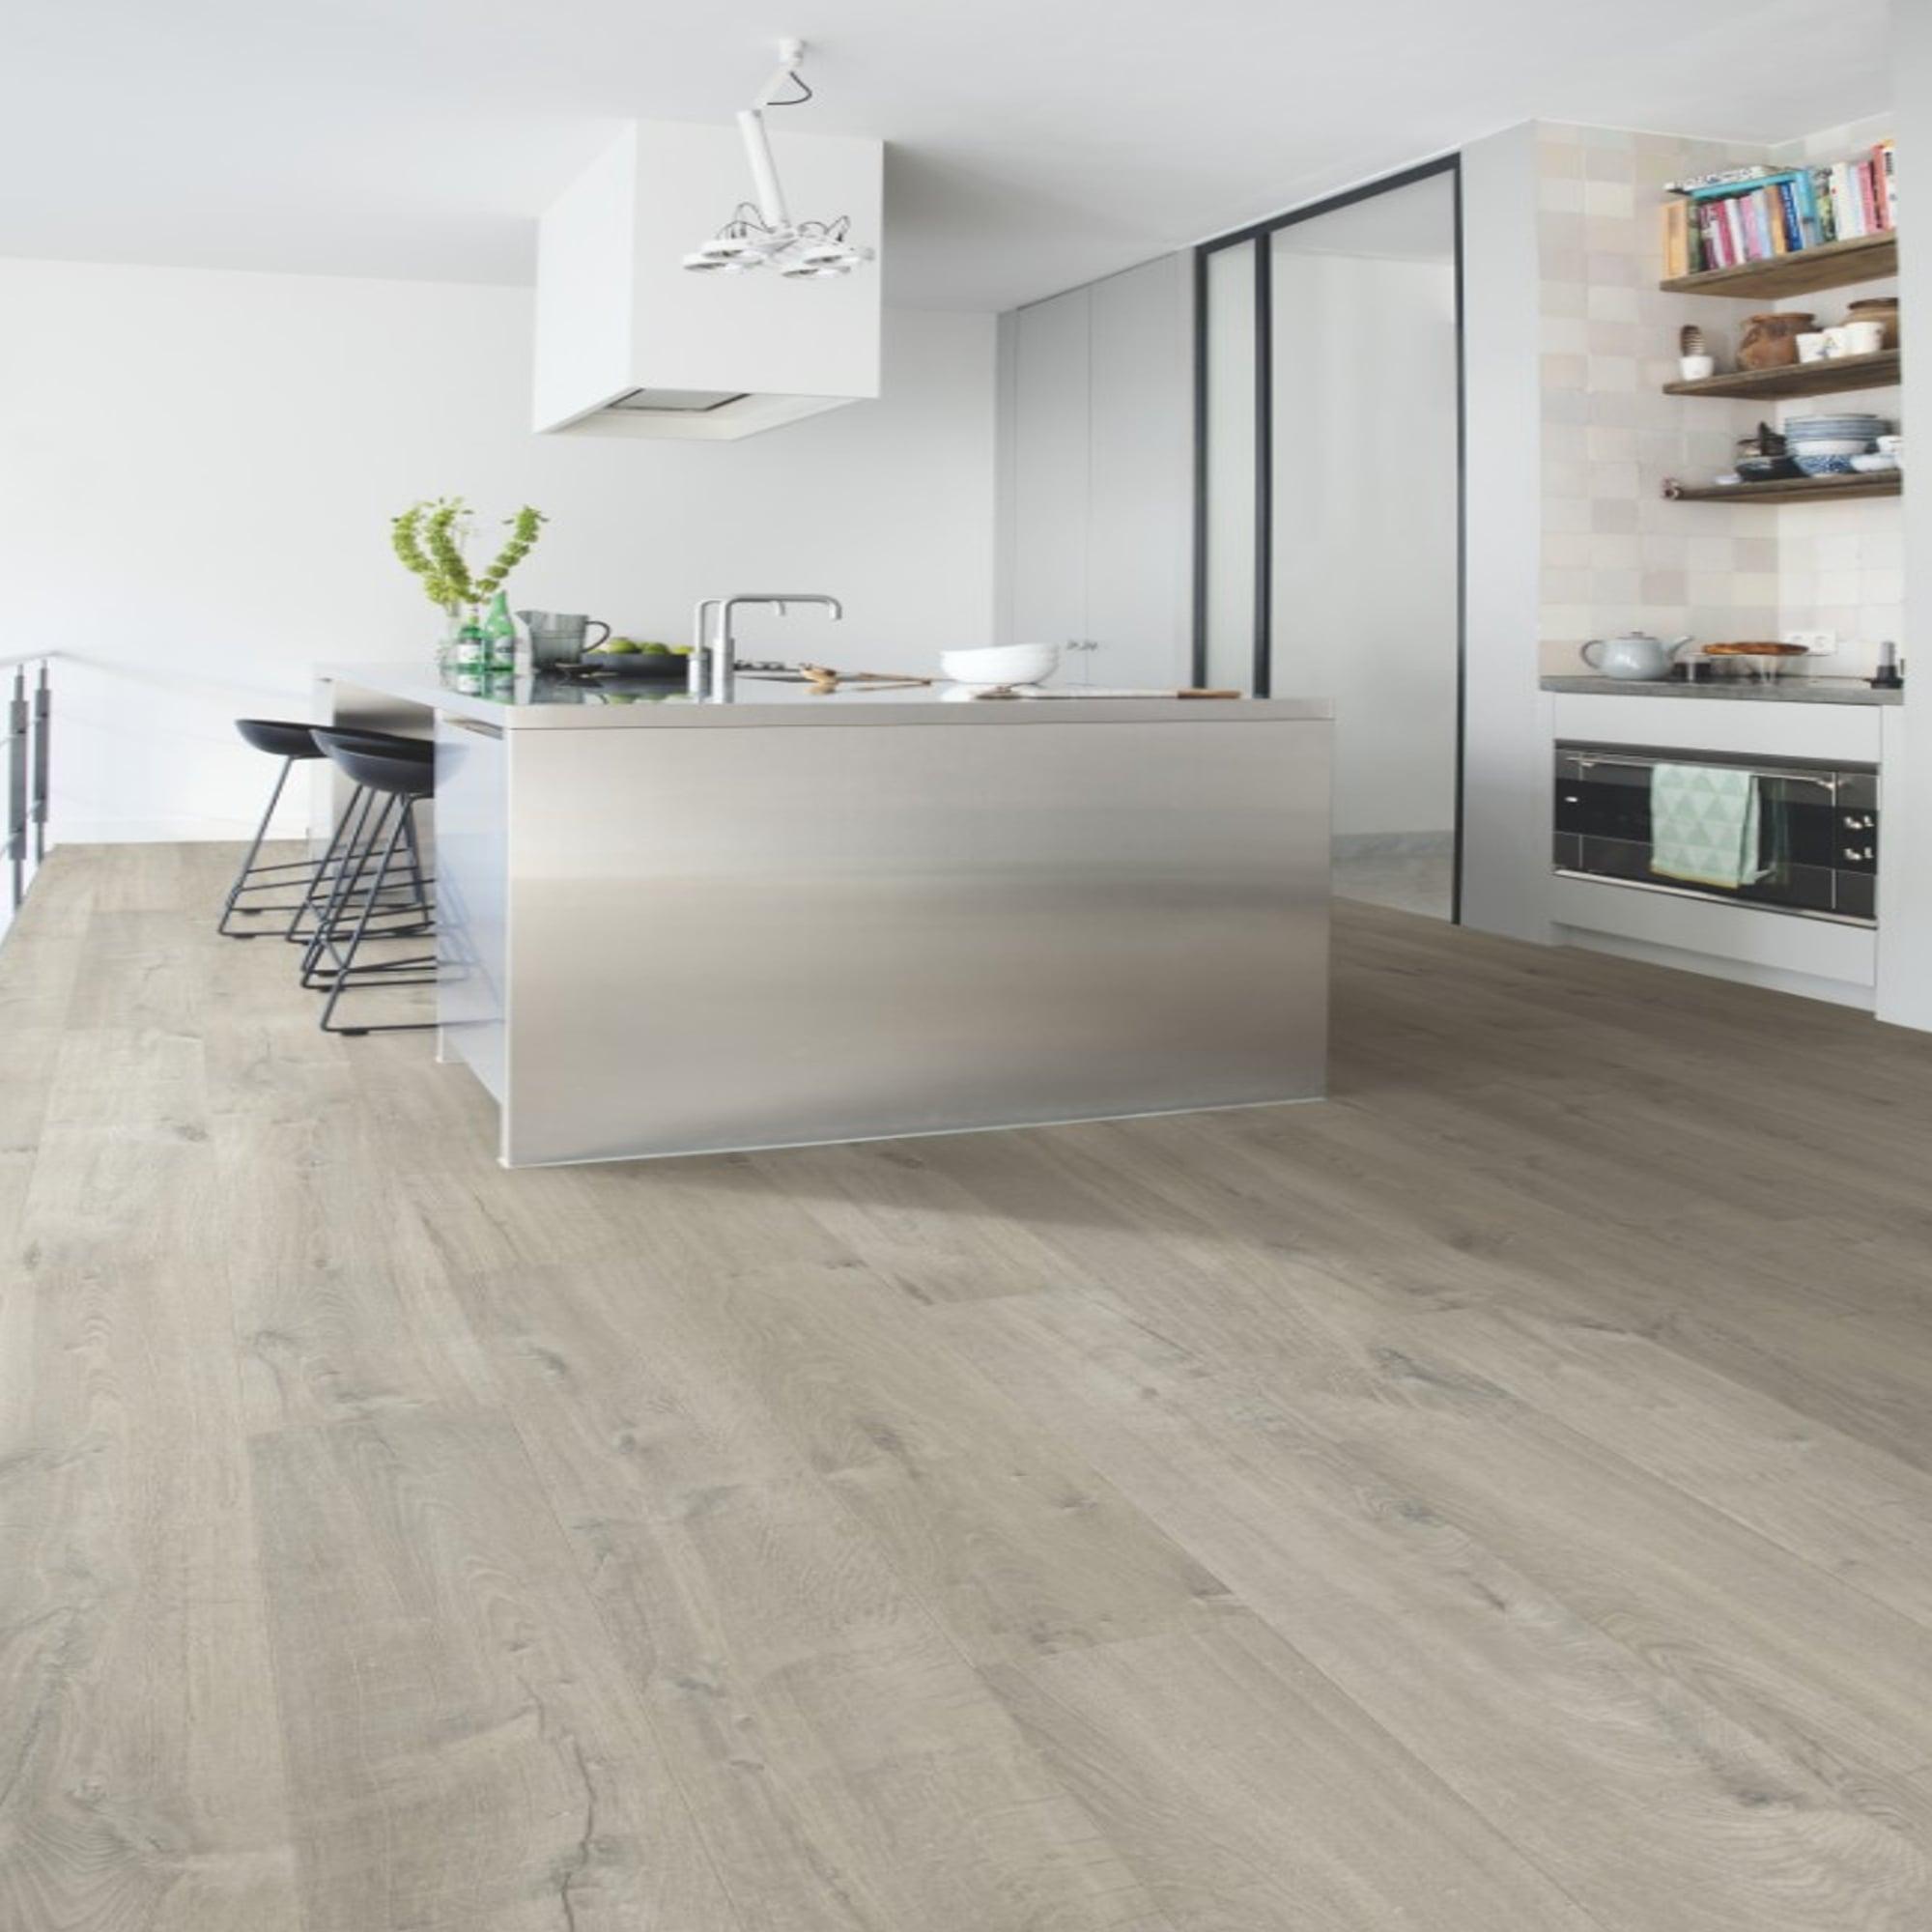 Impressive 5mm Soft Grey Oak Waterproof Laminate Flooring (IM3555)